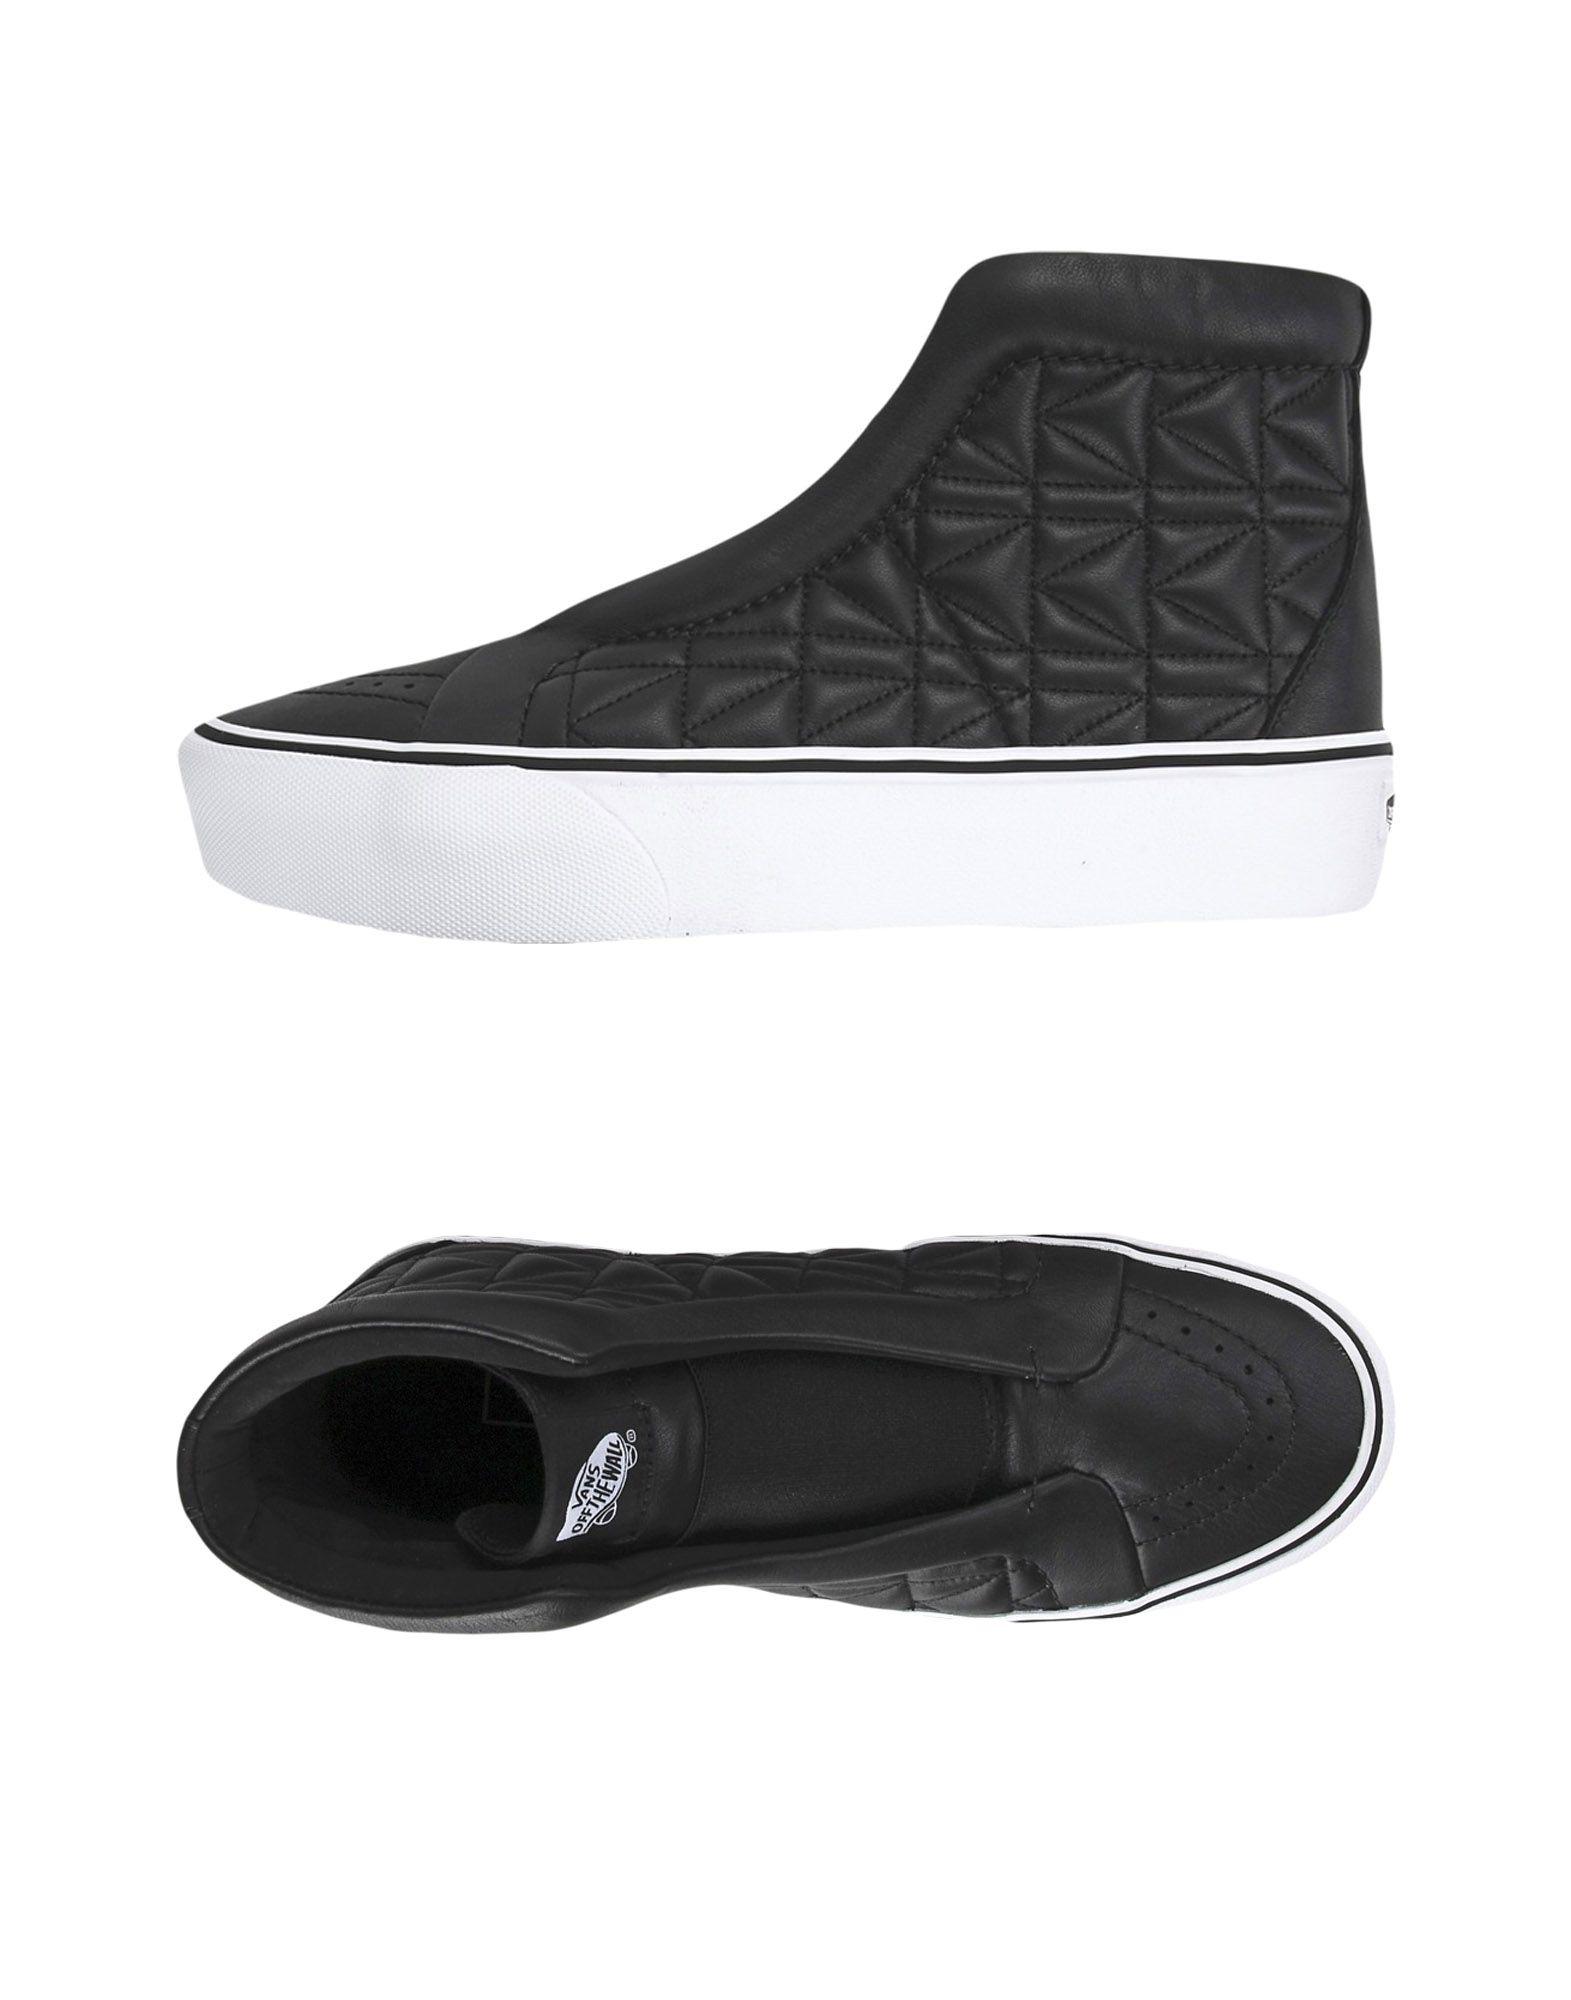 VANS x KARL LAGERFELD Высокие кеды и кроссовки fendi x karl lagerfeld низкие кеды и кроссовки